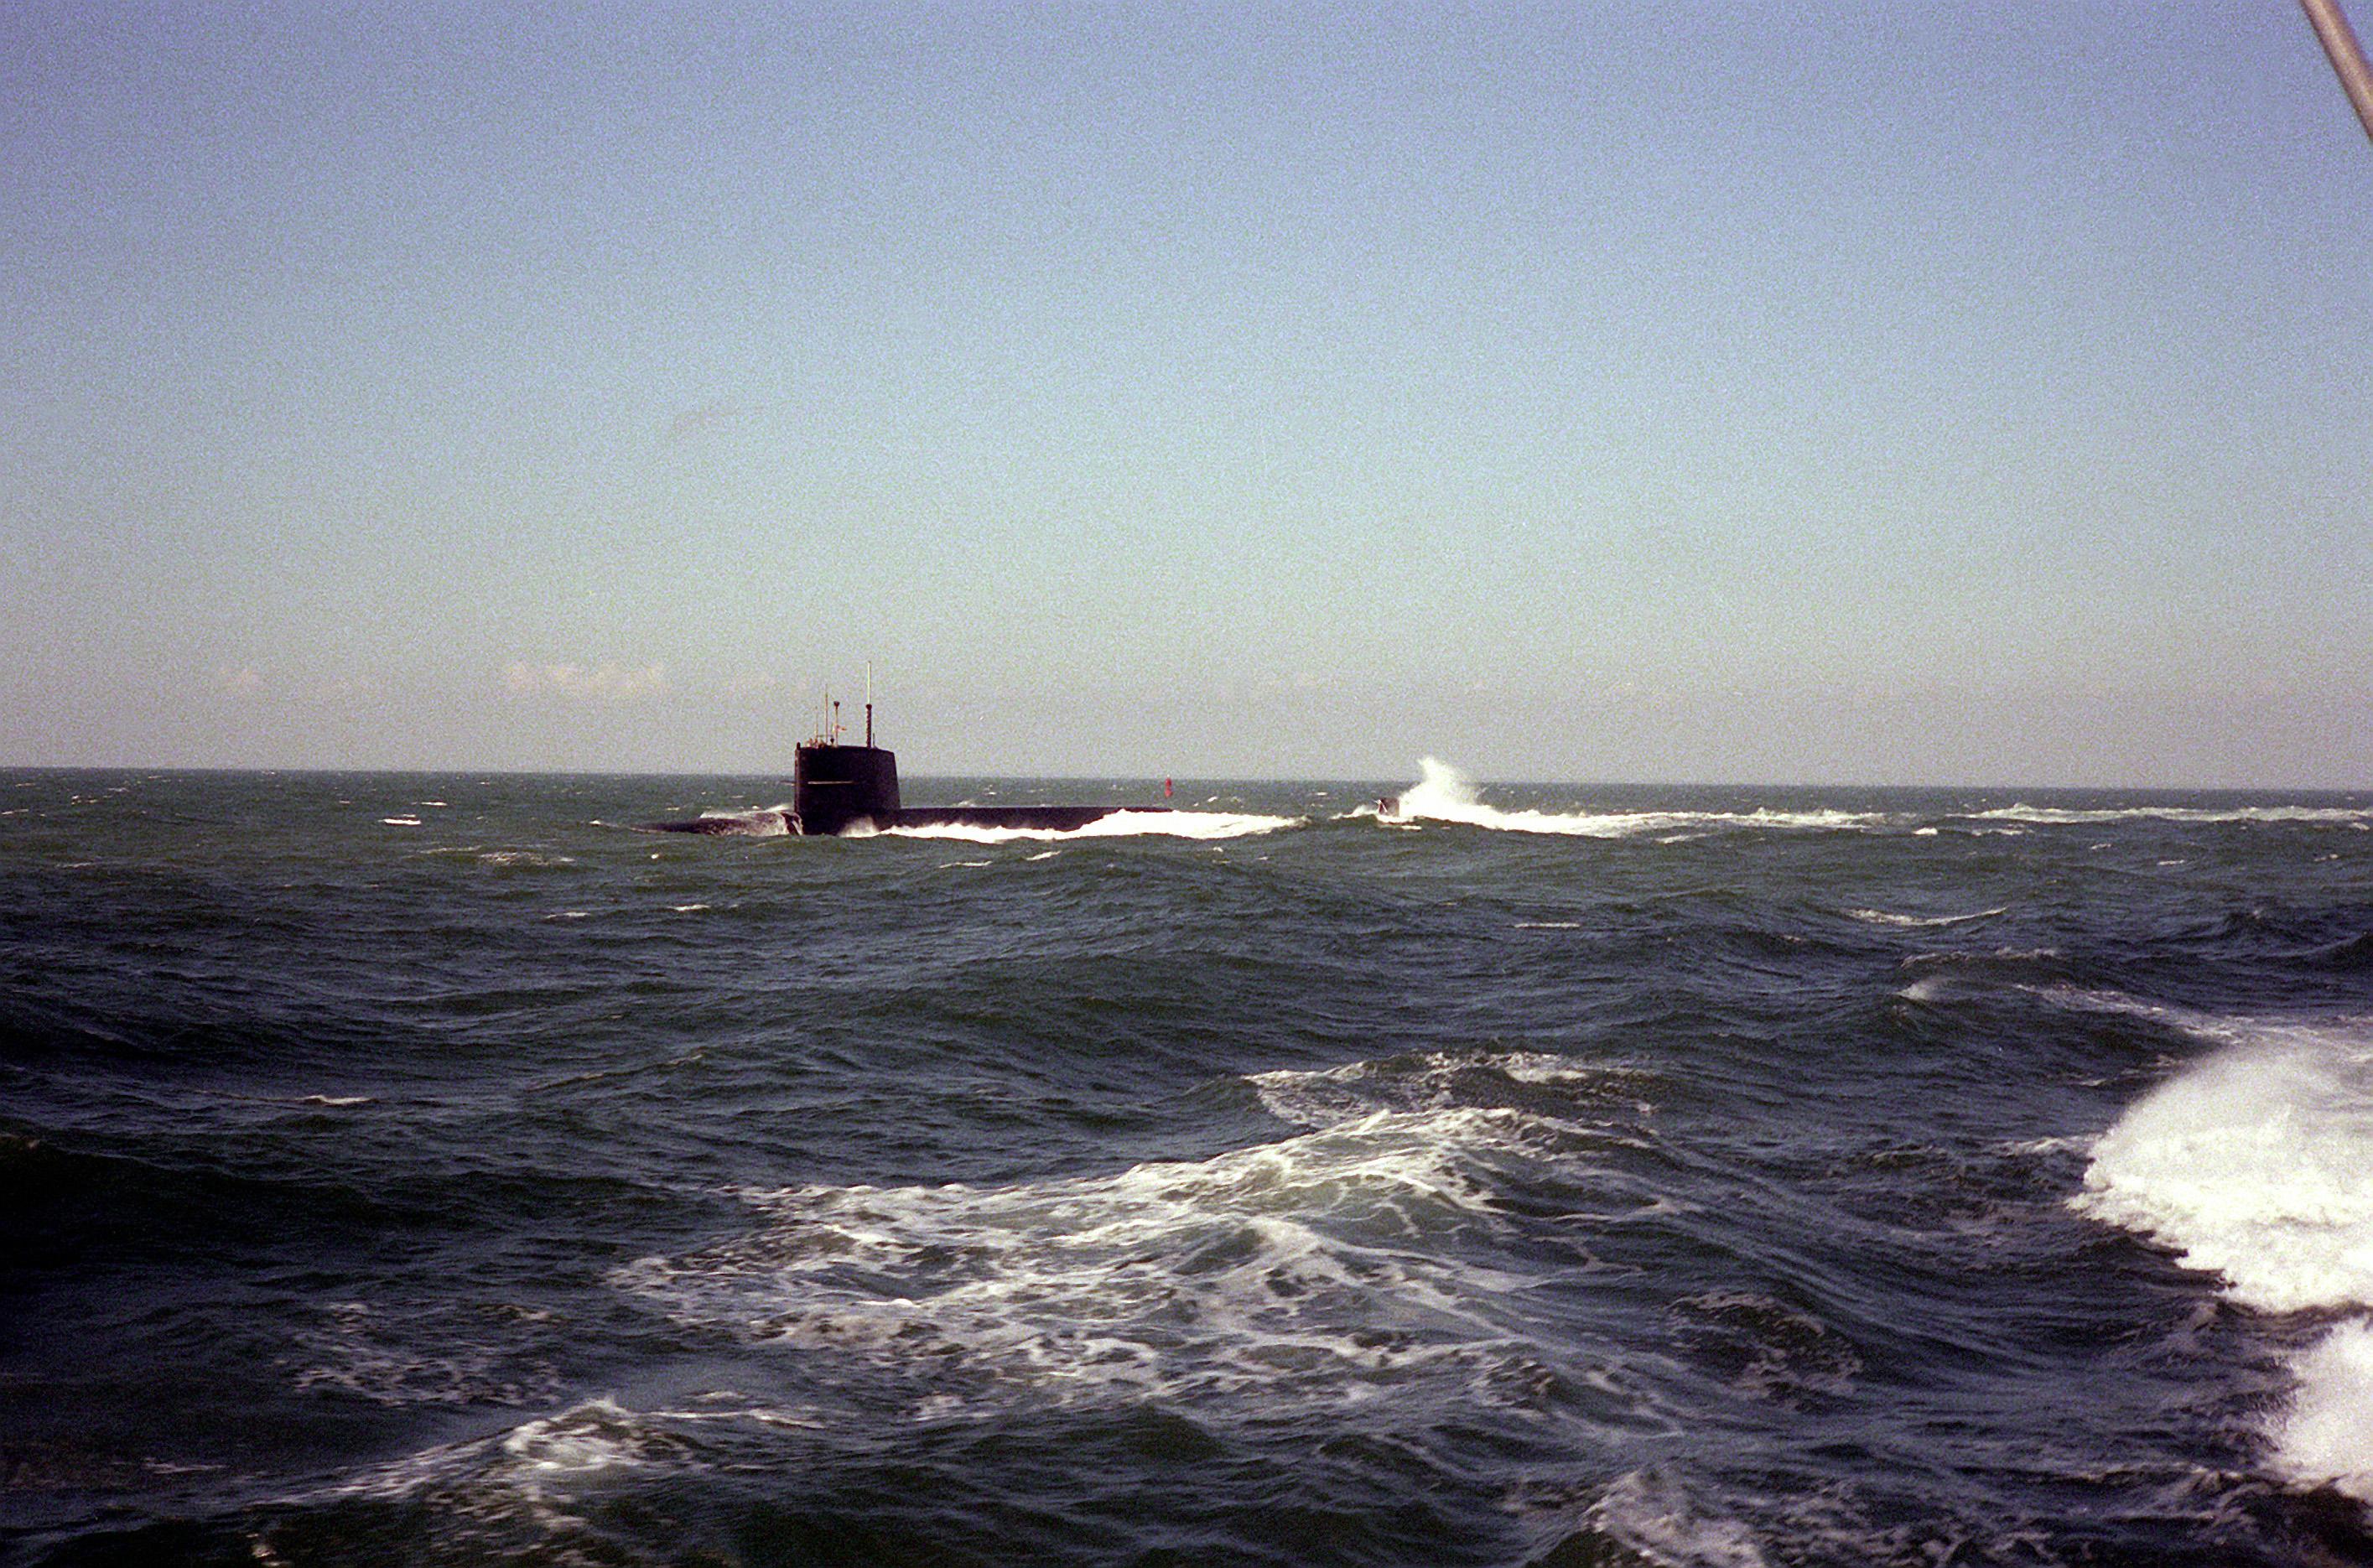 USS Tecumseh SSBN-628